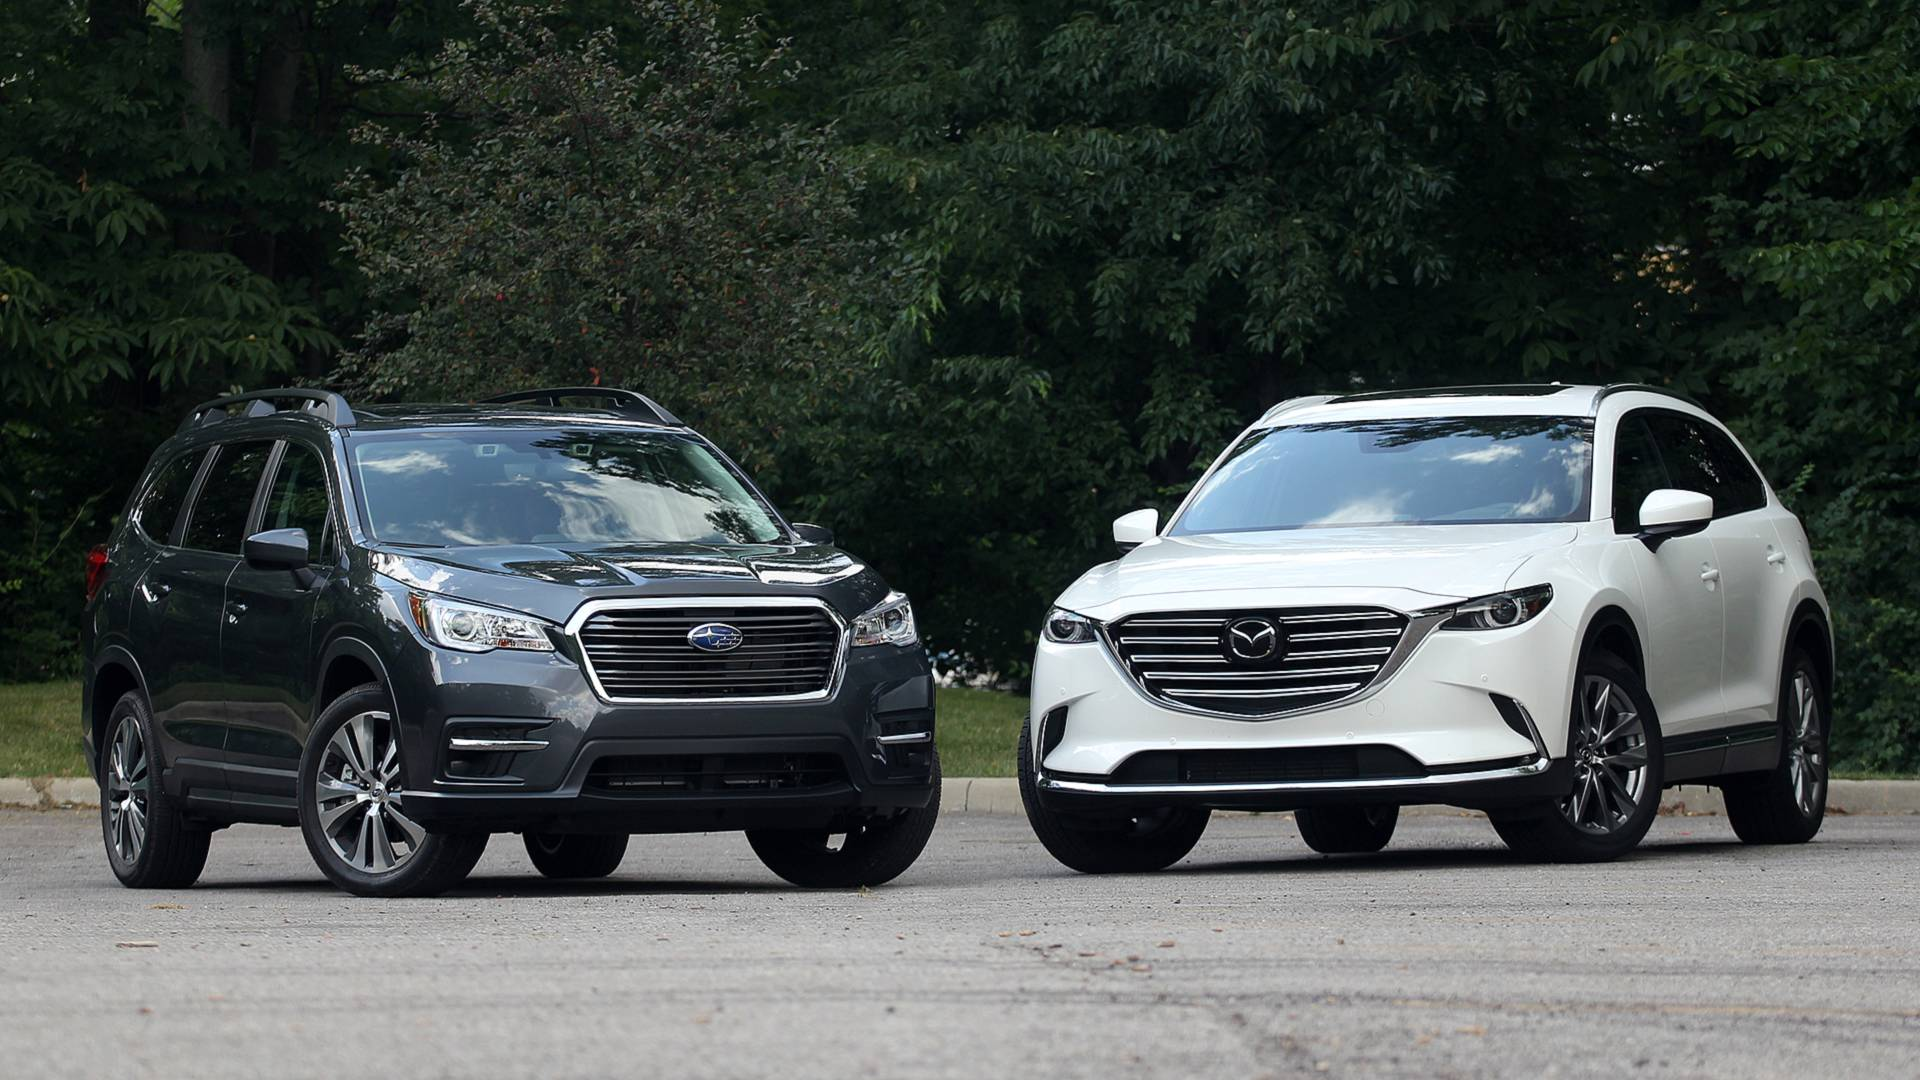 Subaru Ascent Vs Mazda Cx 9 Substance Meet Style